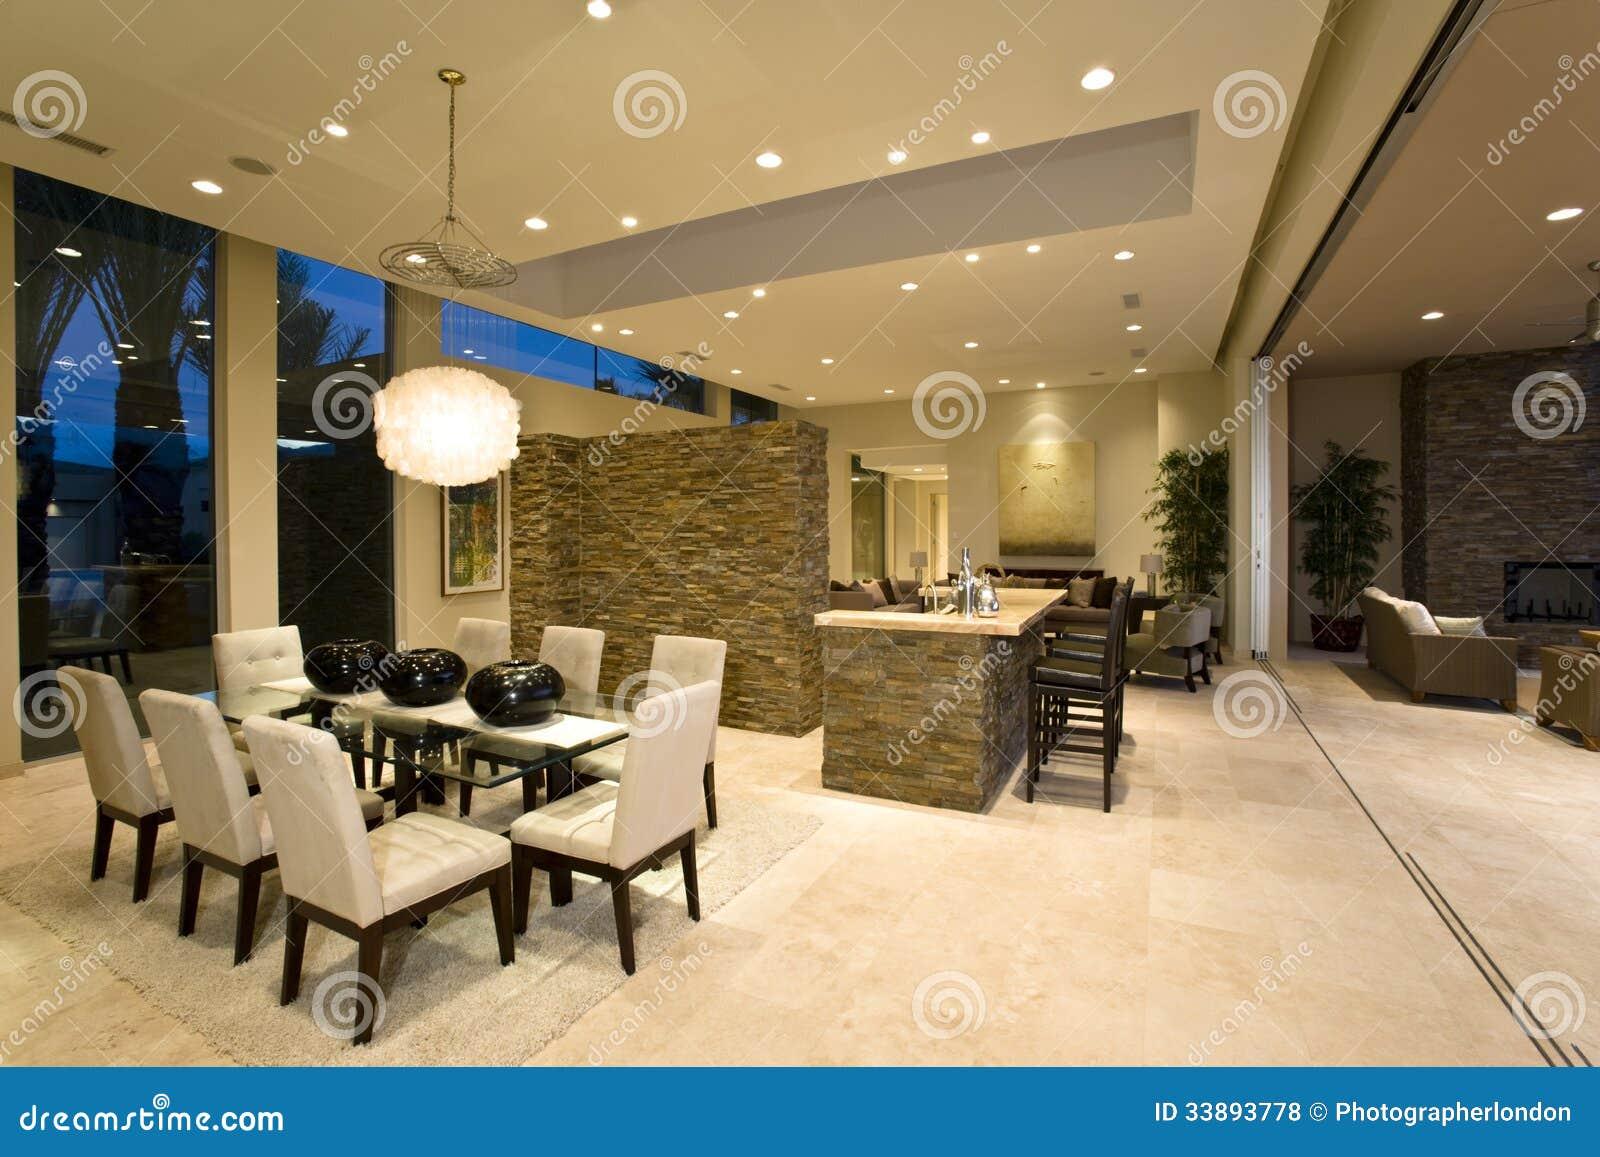 Modern and spacious house interior royalty free stock photos image 33893778 - Modern houses interior kitchen ...